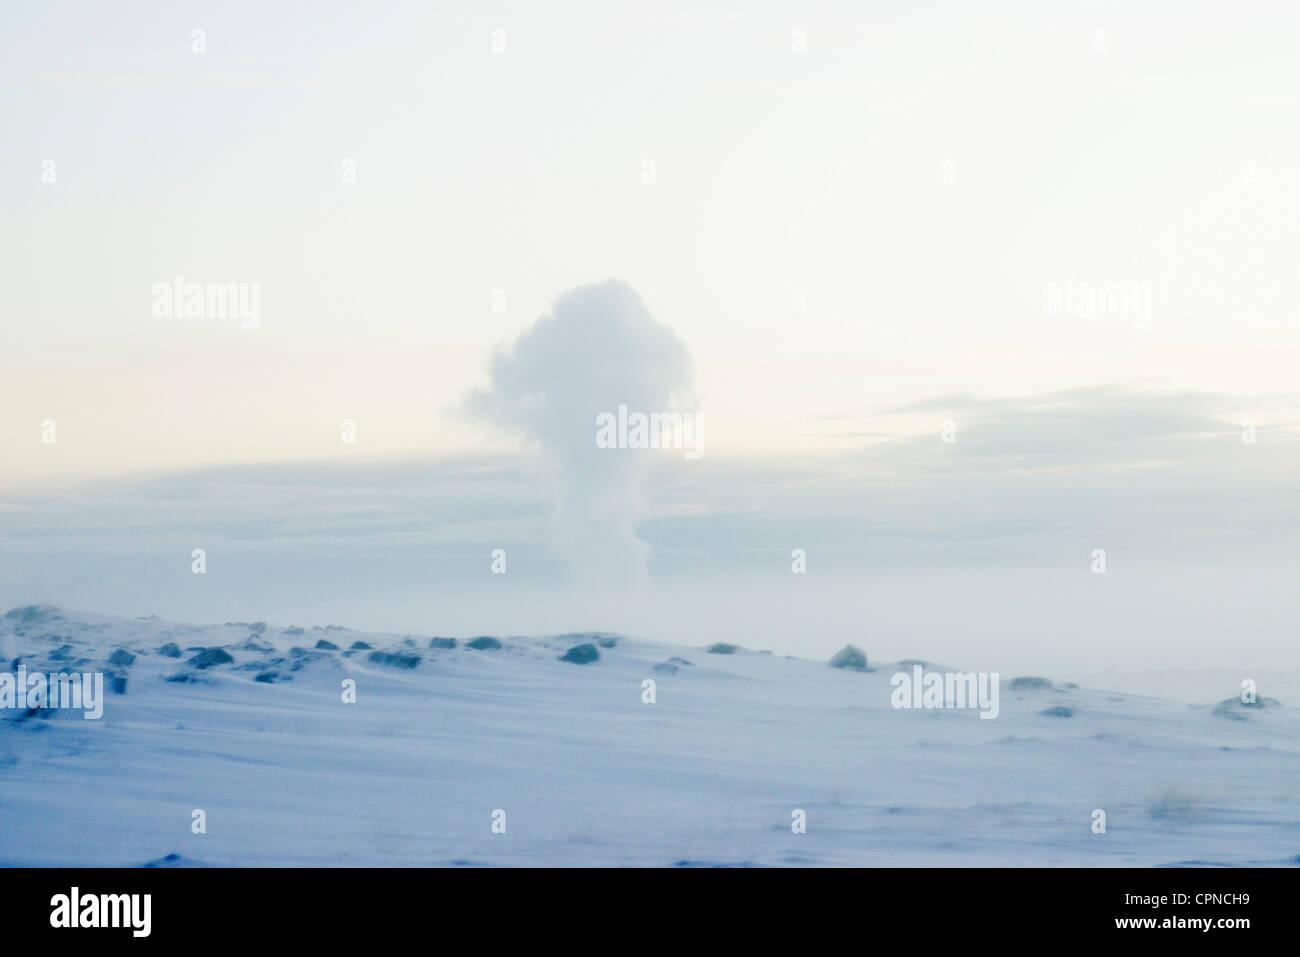 Geothermal steam, Reykjanes Peninsula, Iceland - Stock Image